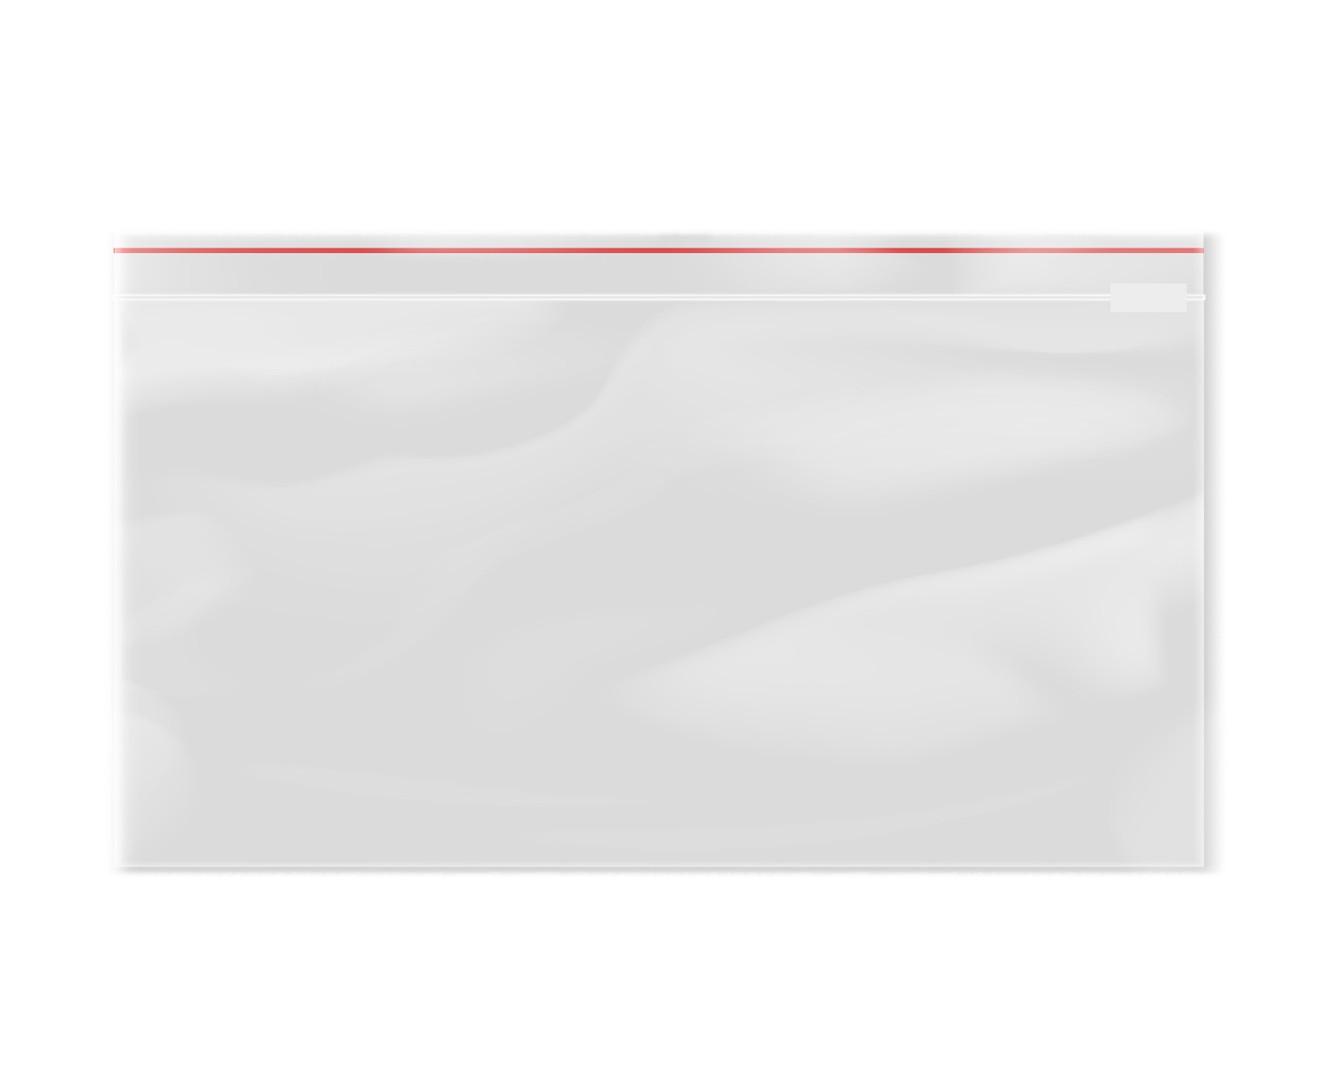 03_LDPE-Ziehverschlussbeutel_736x600